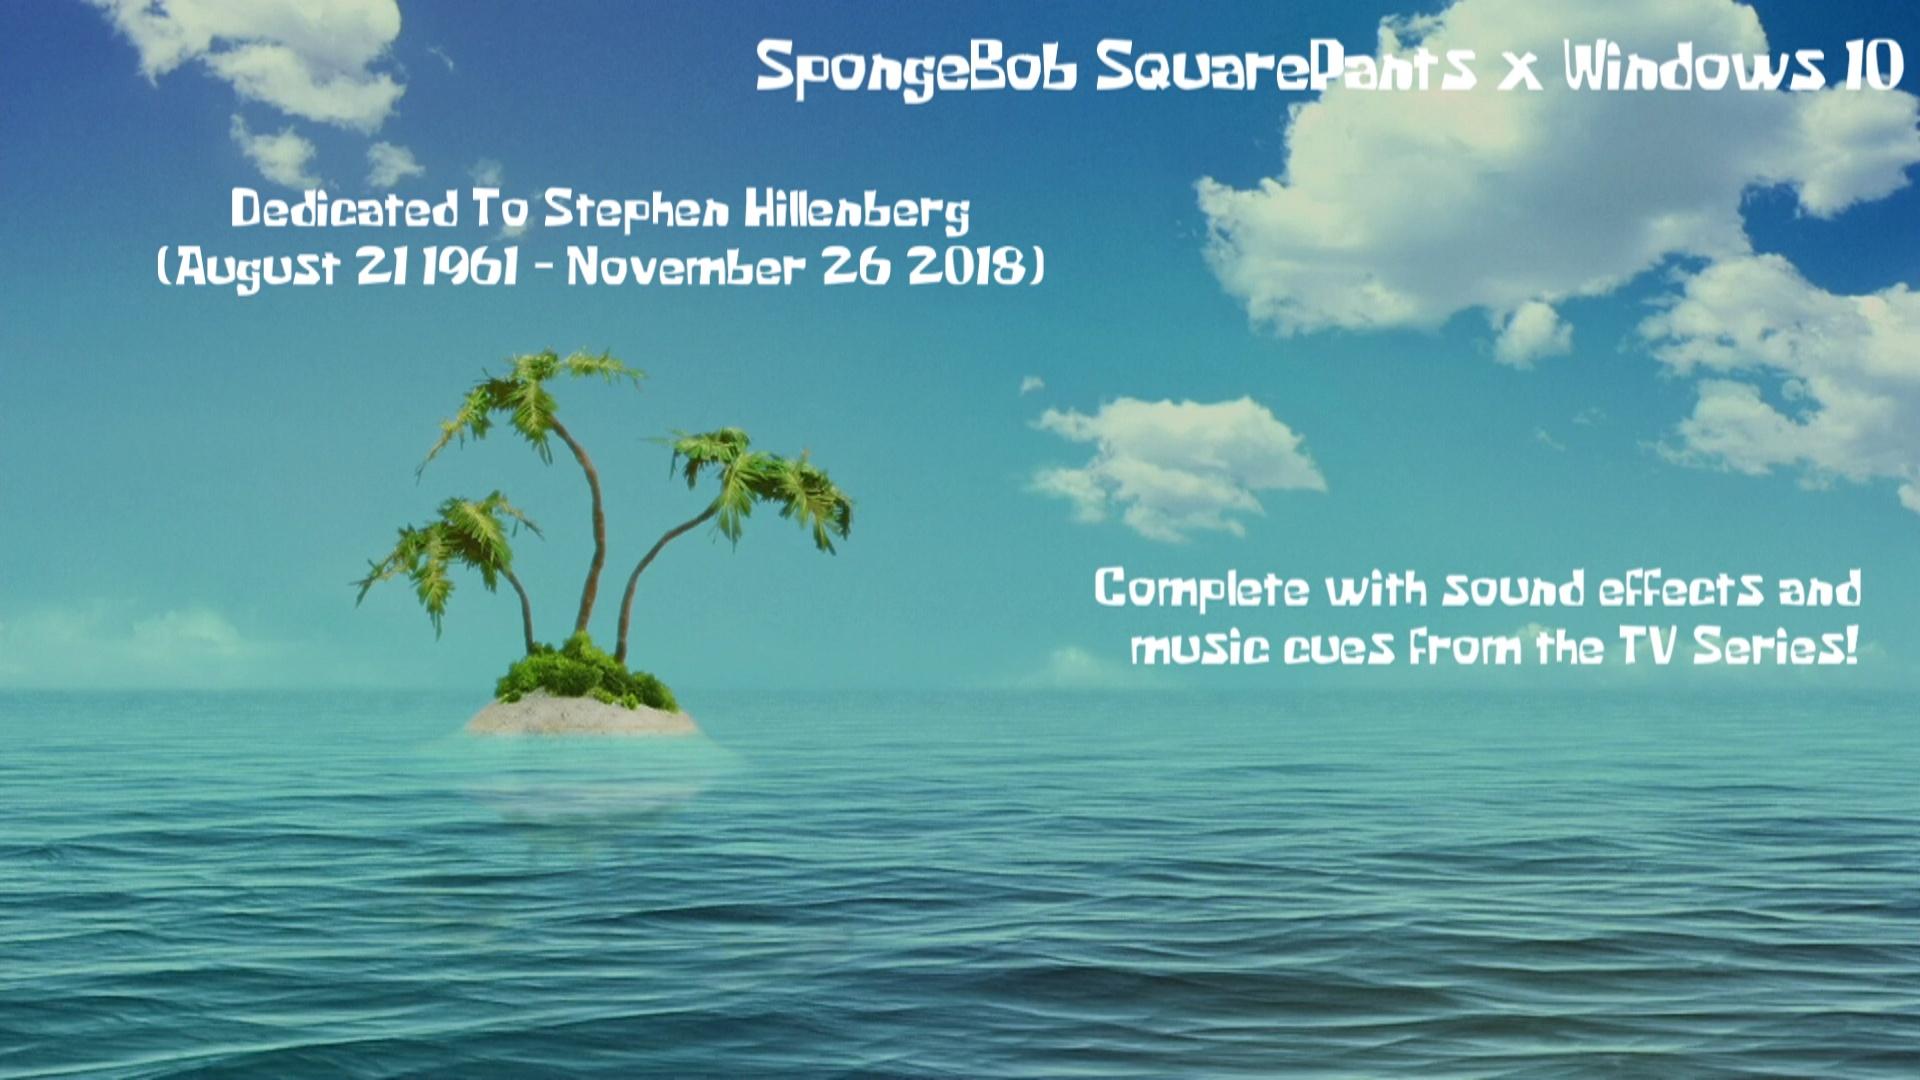 SpongeBob SquarePants Windows 10 Theme by nc3studios08 on